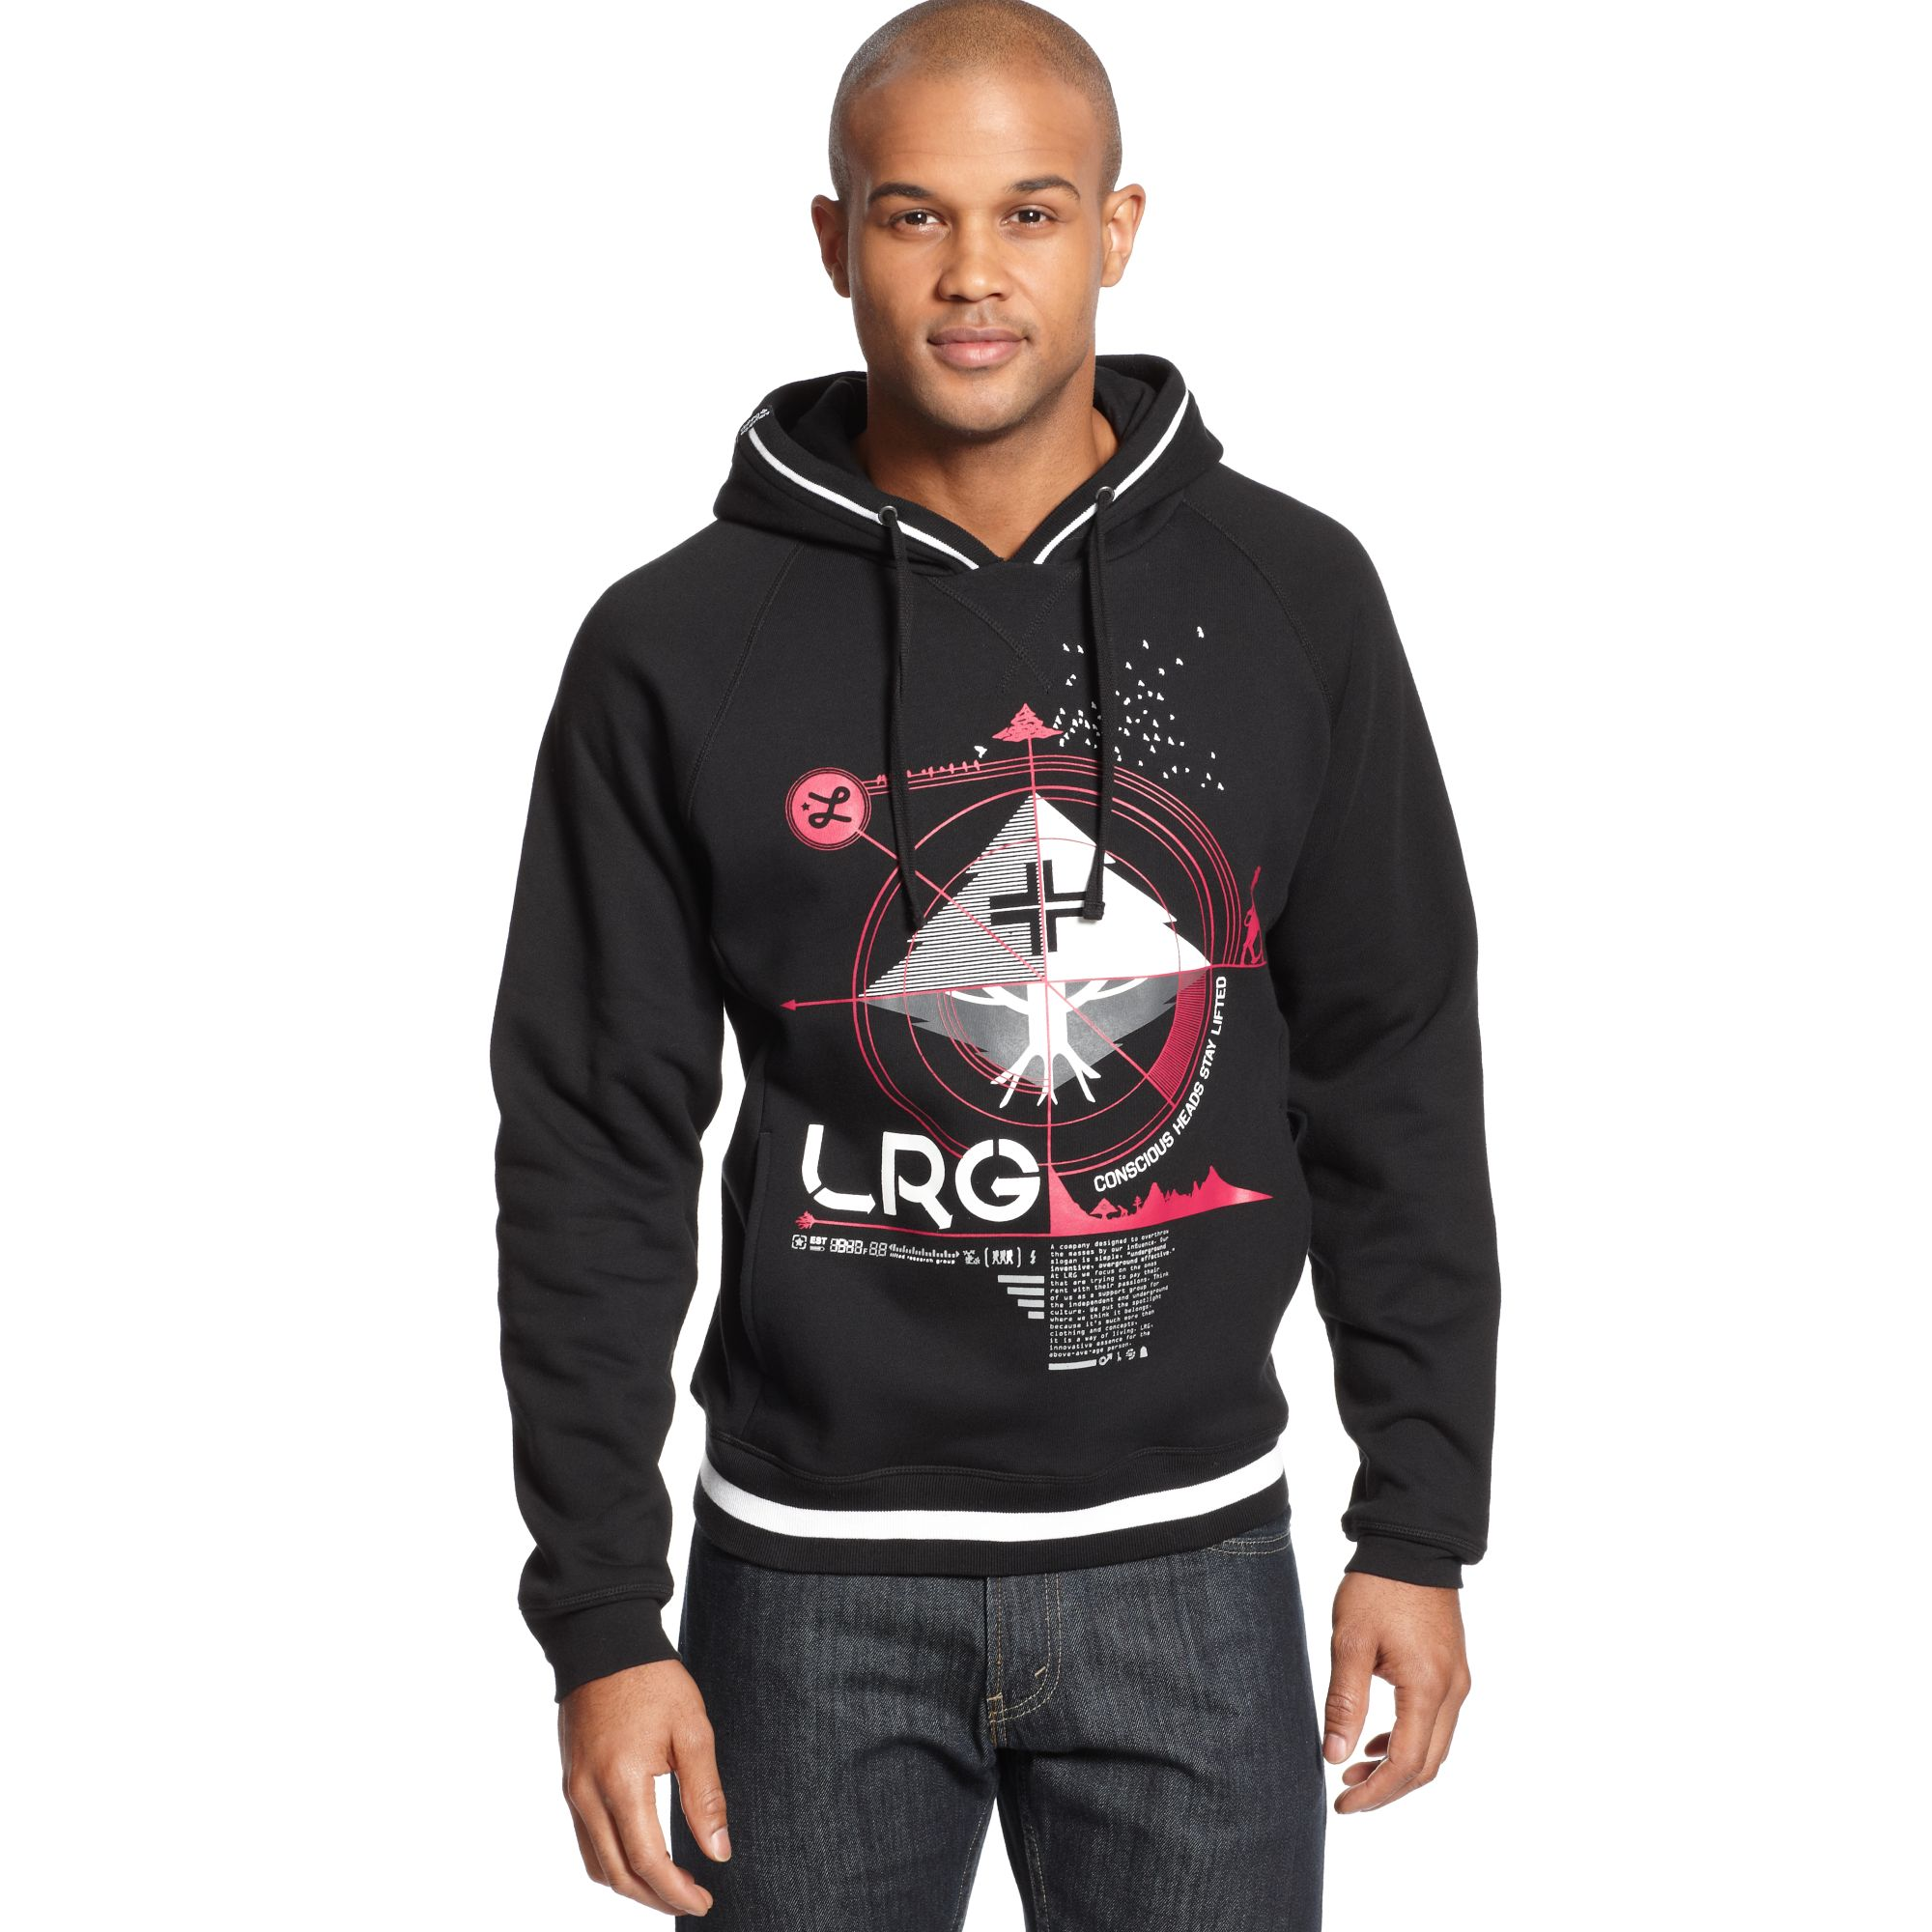 Lrg clothing store